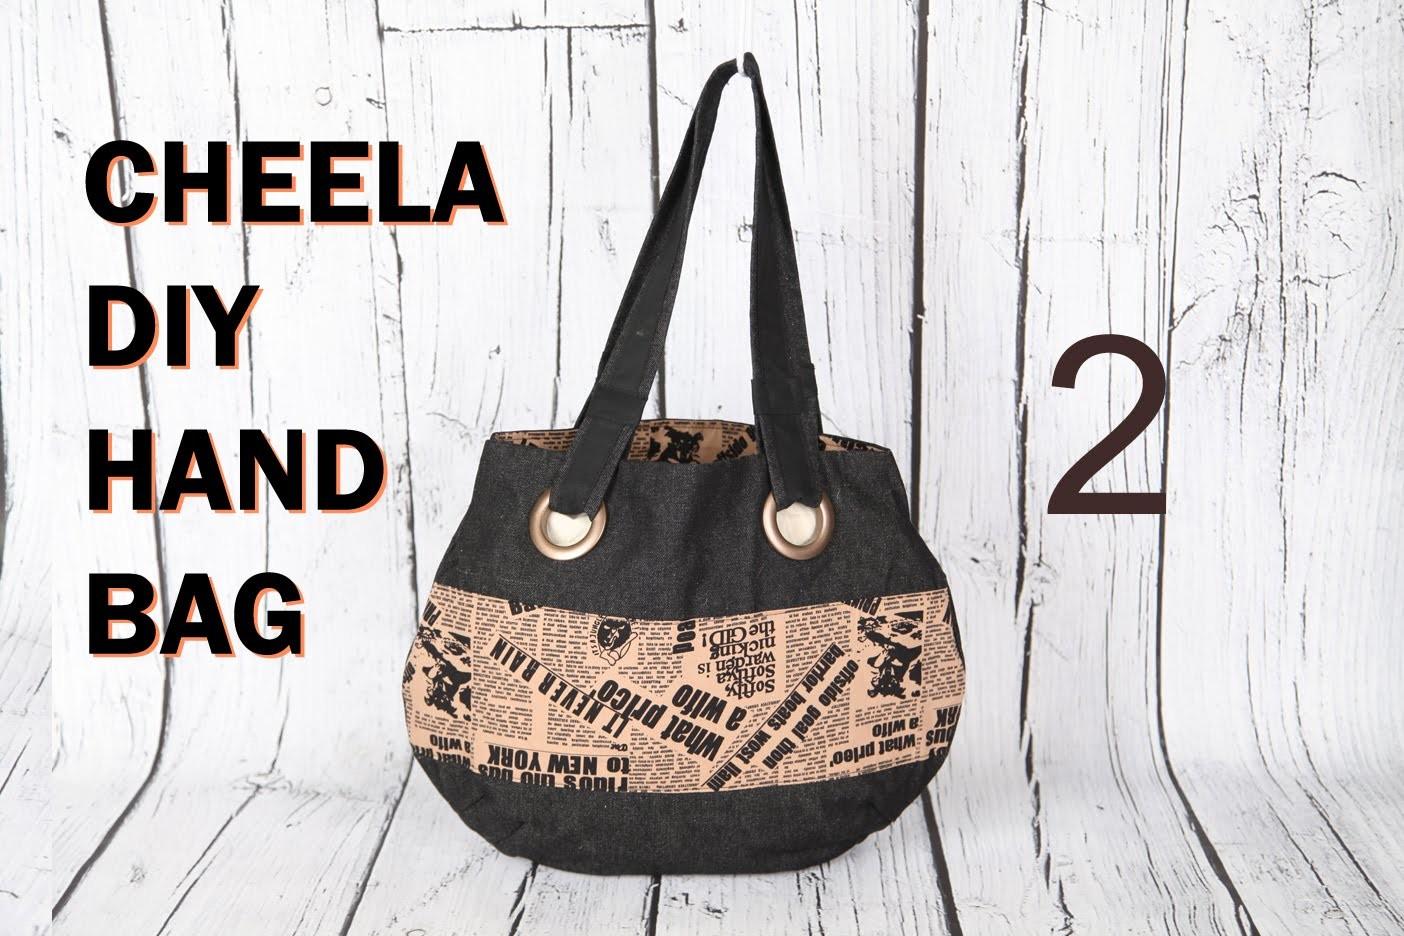 Cheela 3b. Curtain eyelet rings finish. Bias ring finish to handles. DIY Bag Vol 20B